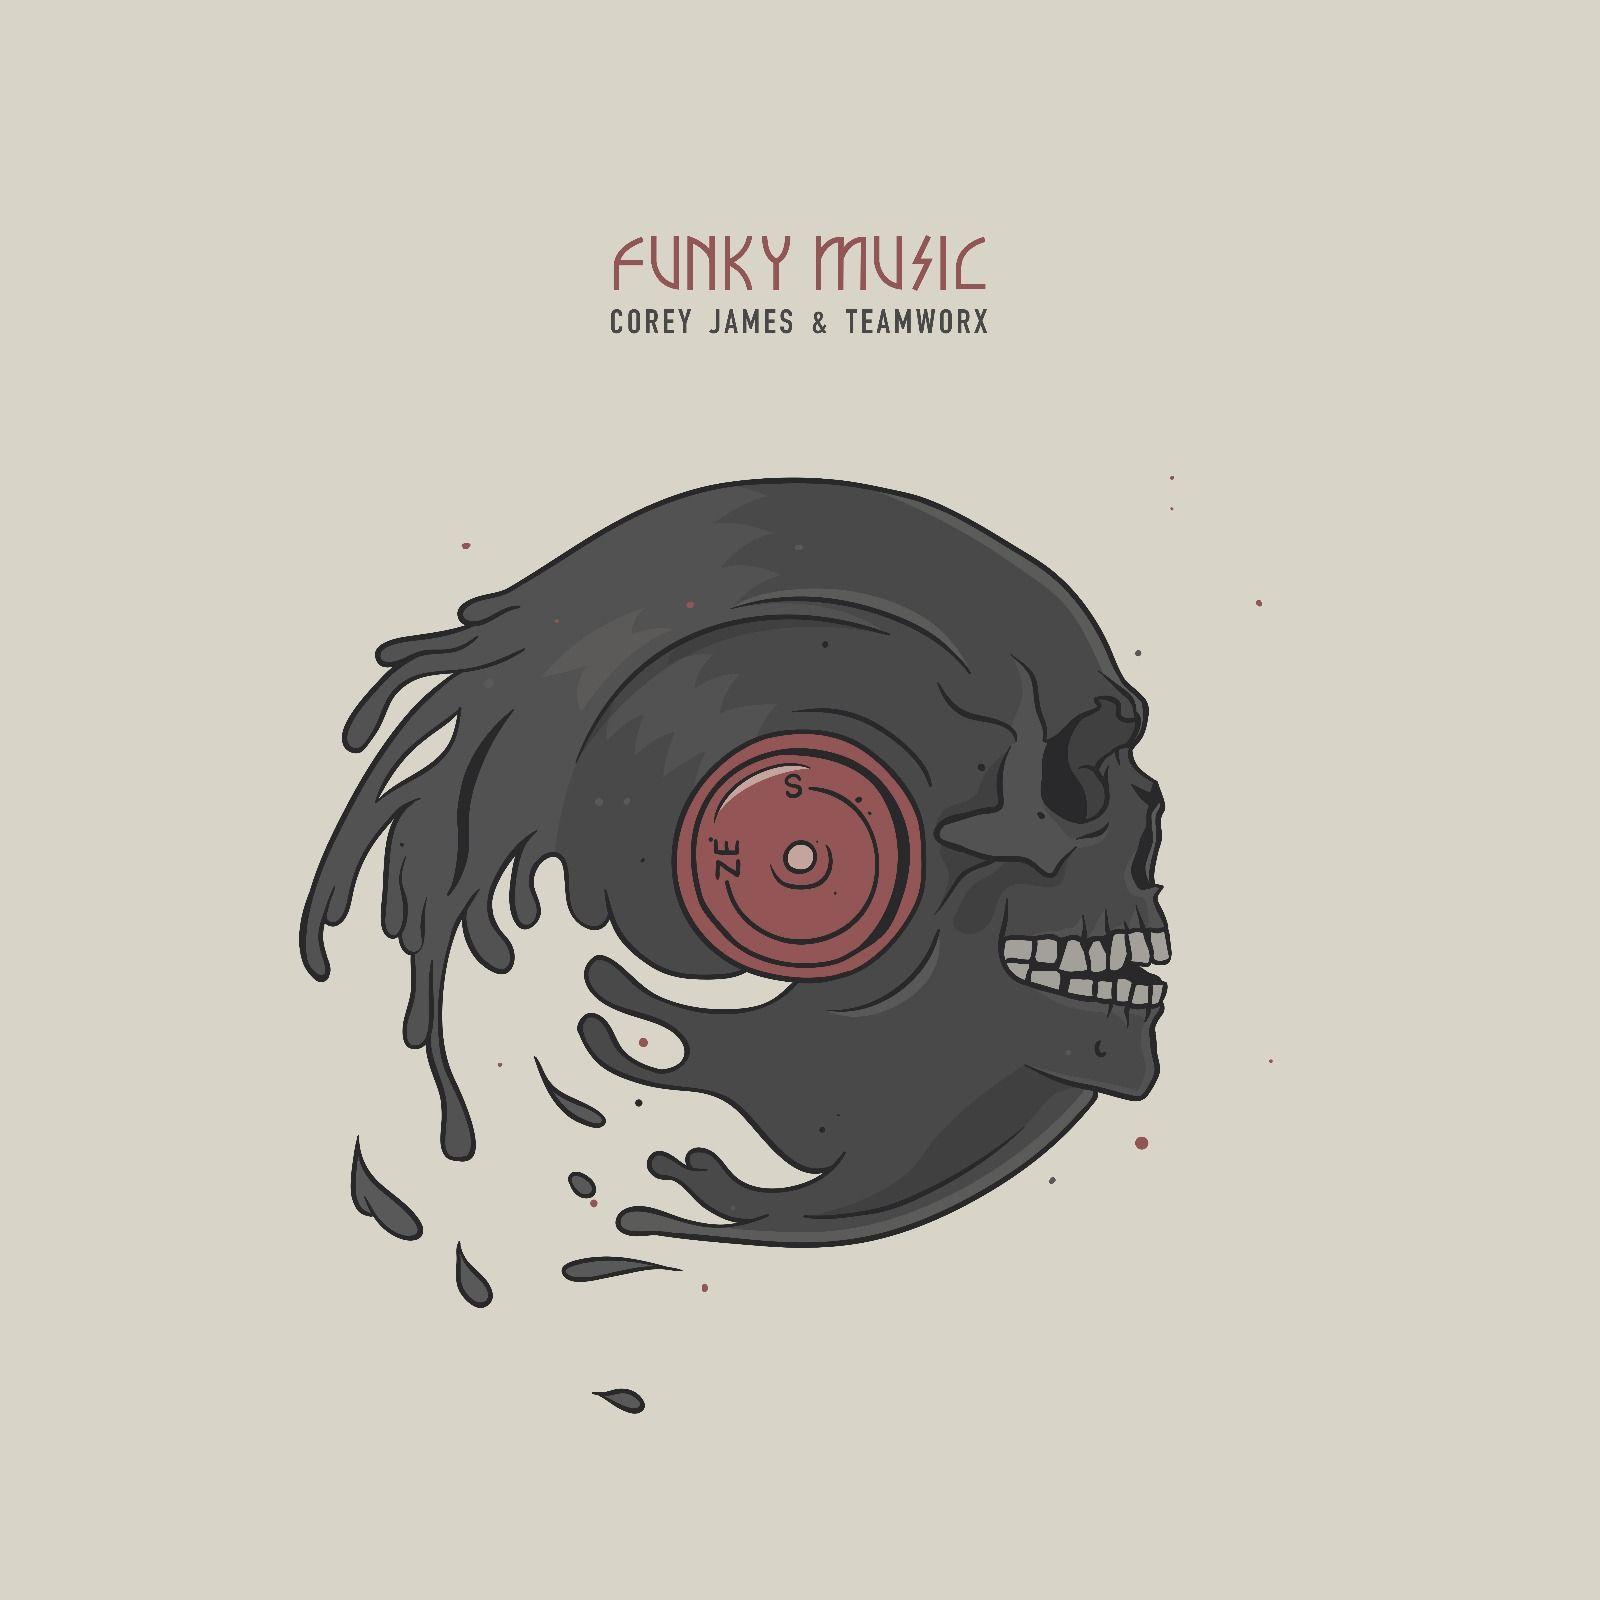 artwork_corey_james_teamworx_-_funky_music.jpg